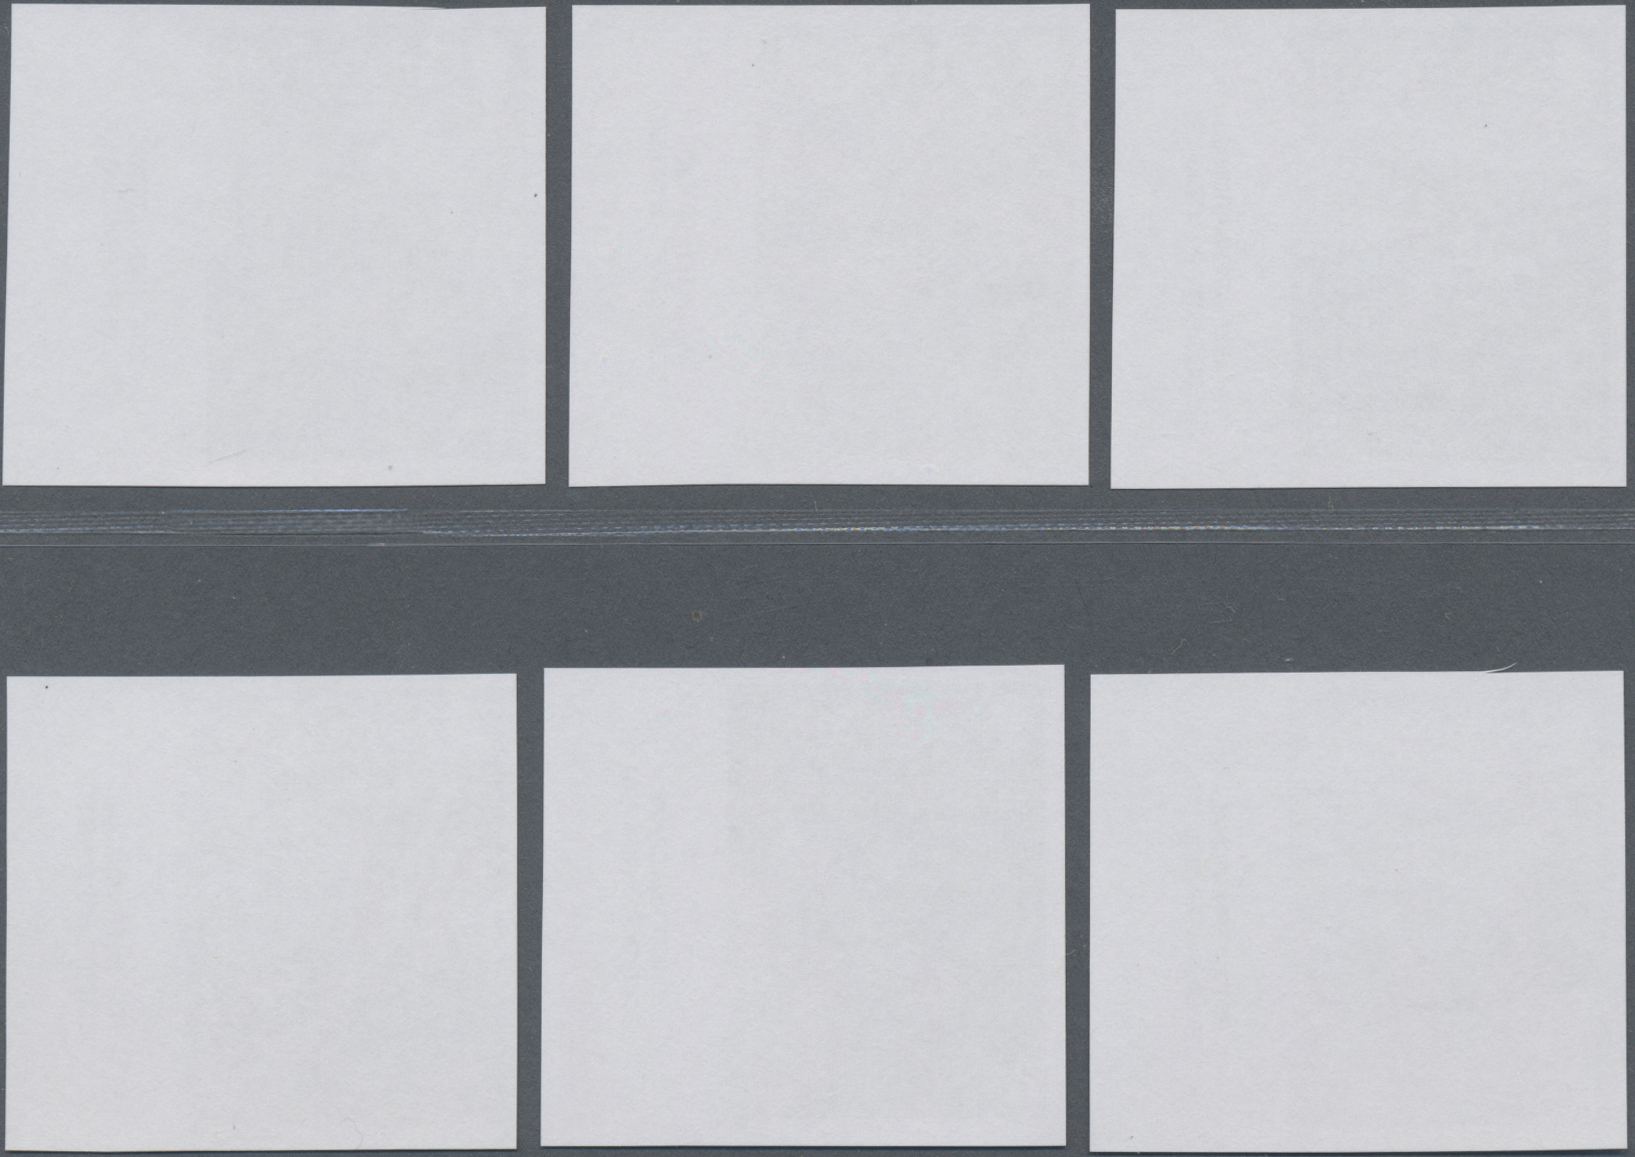 Lot 08531 - Gibraltar  -  Auktionshaus Christoph Gärtner GmbH & Co. KG Sale #48 The Single Lots Philatelie